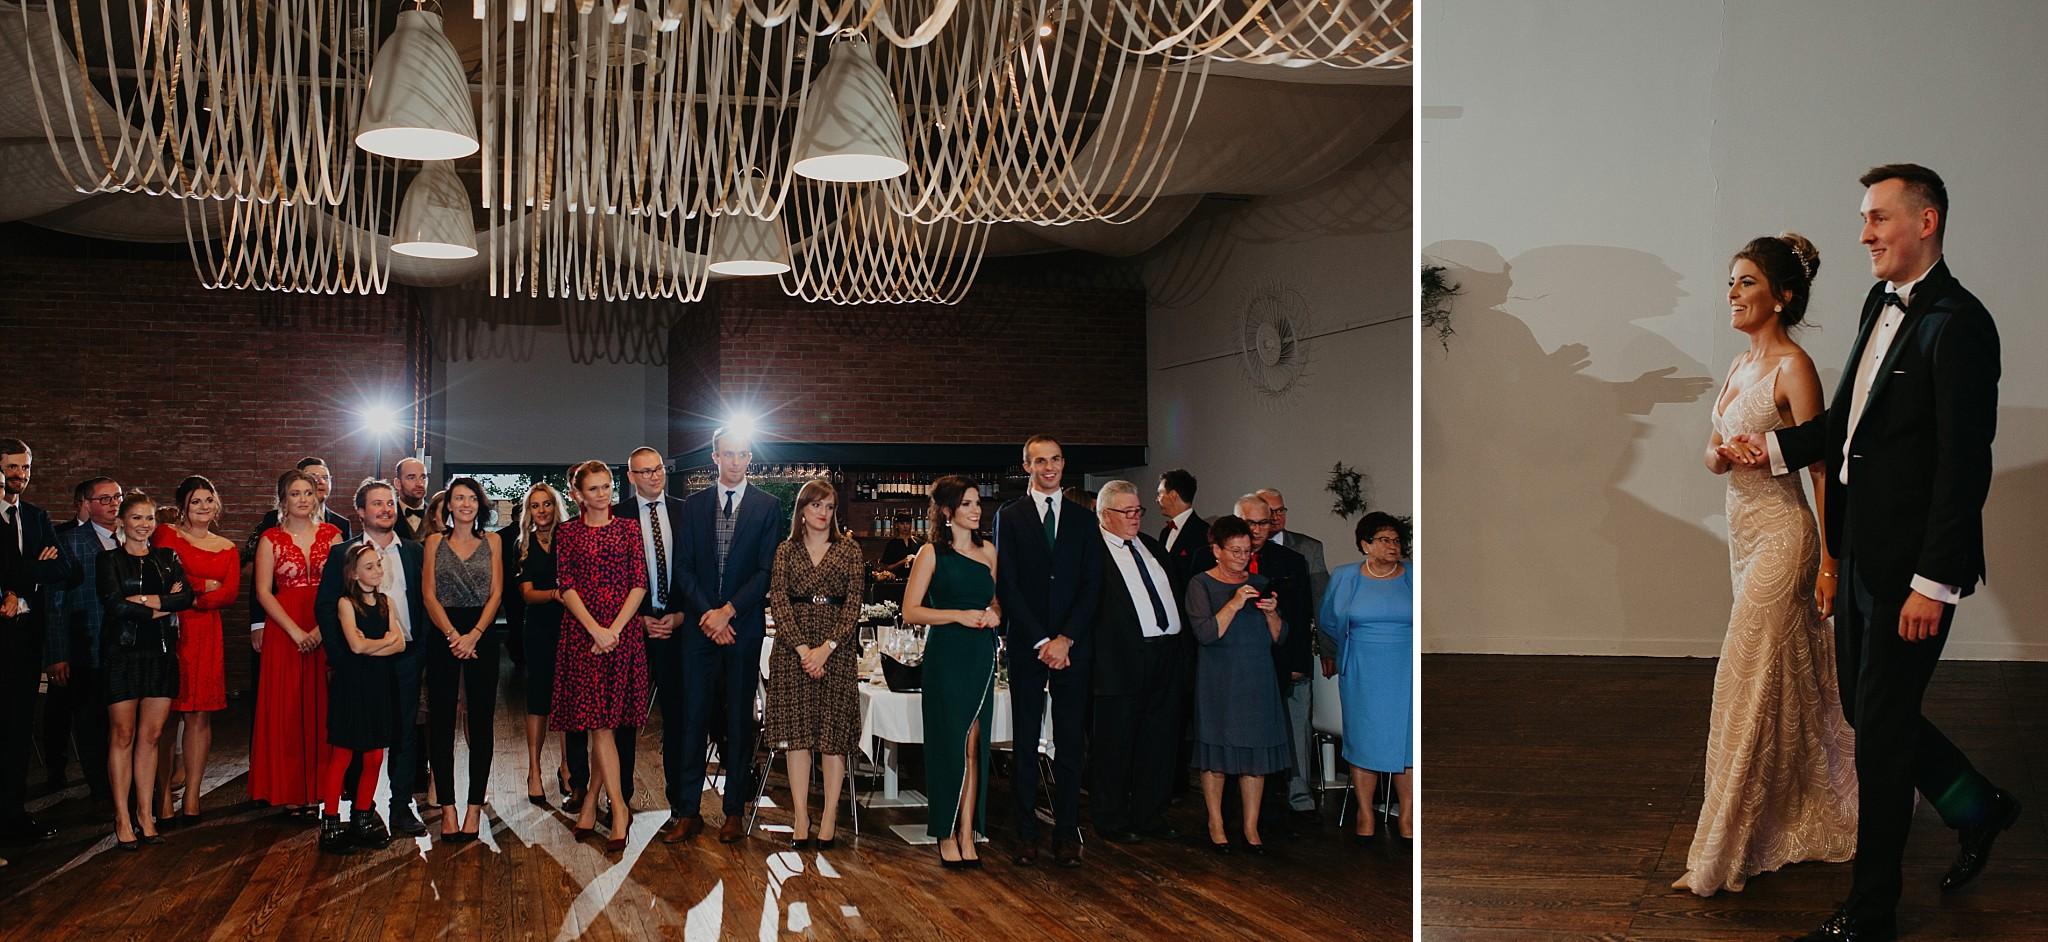 fotograf poznan wesele dobra truskawka piekne wesele pod poznaniem wesele w dobrej truskawce piekna para mloda slub marzen slub koronawirus slub listopad wesele koronawirus 307